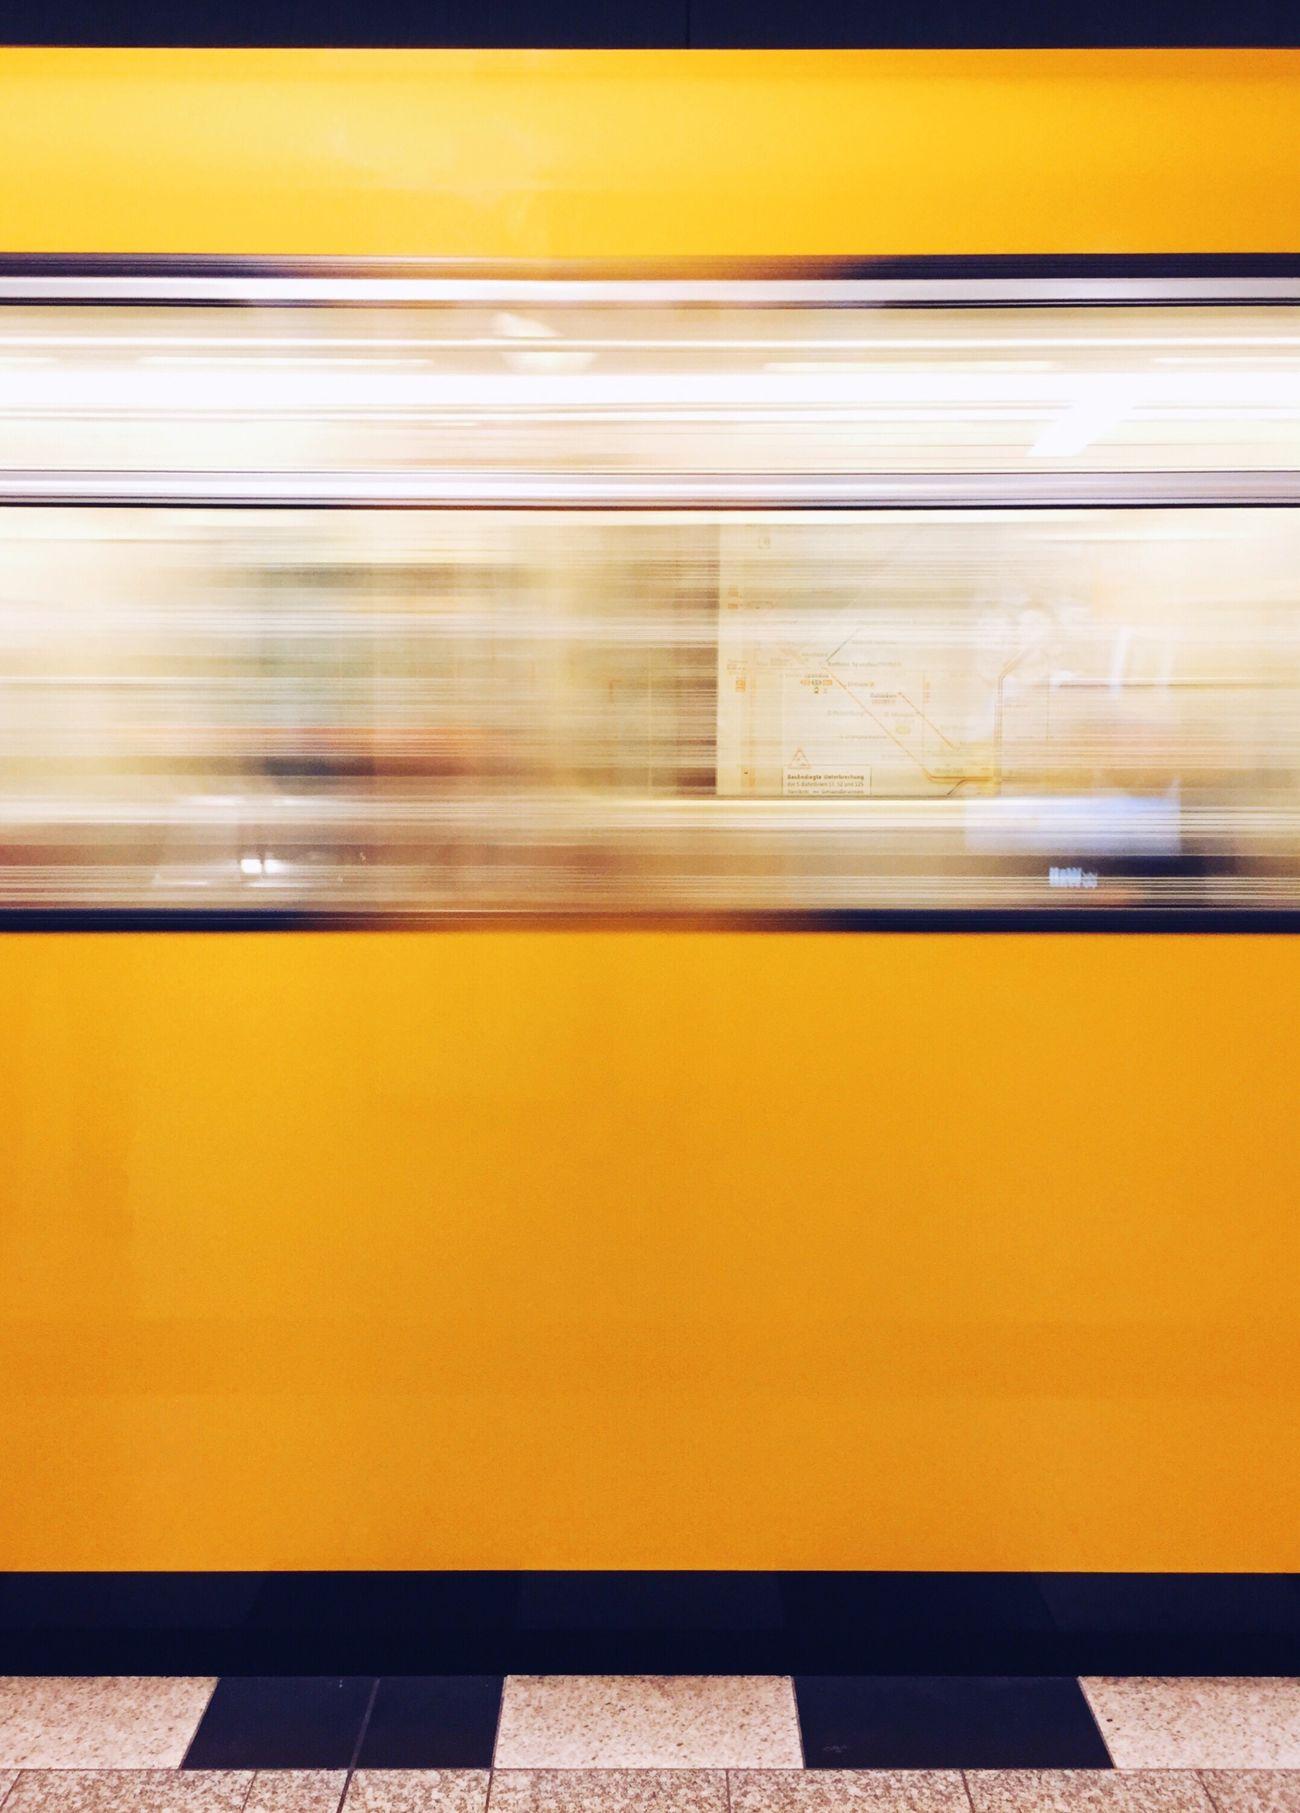 Berlin Ubahn Berlin